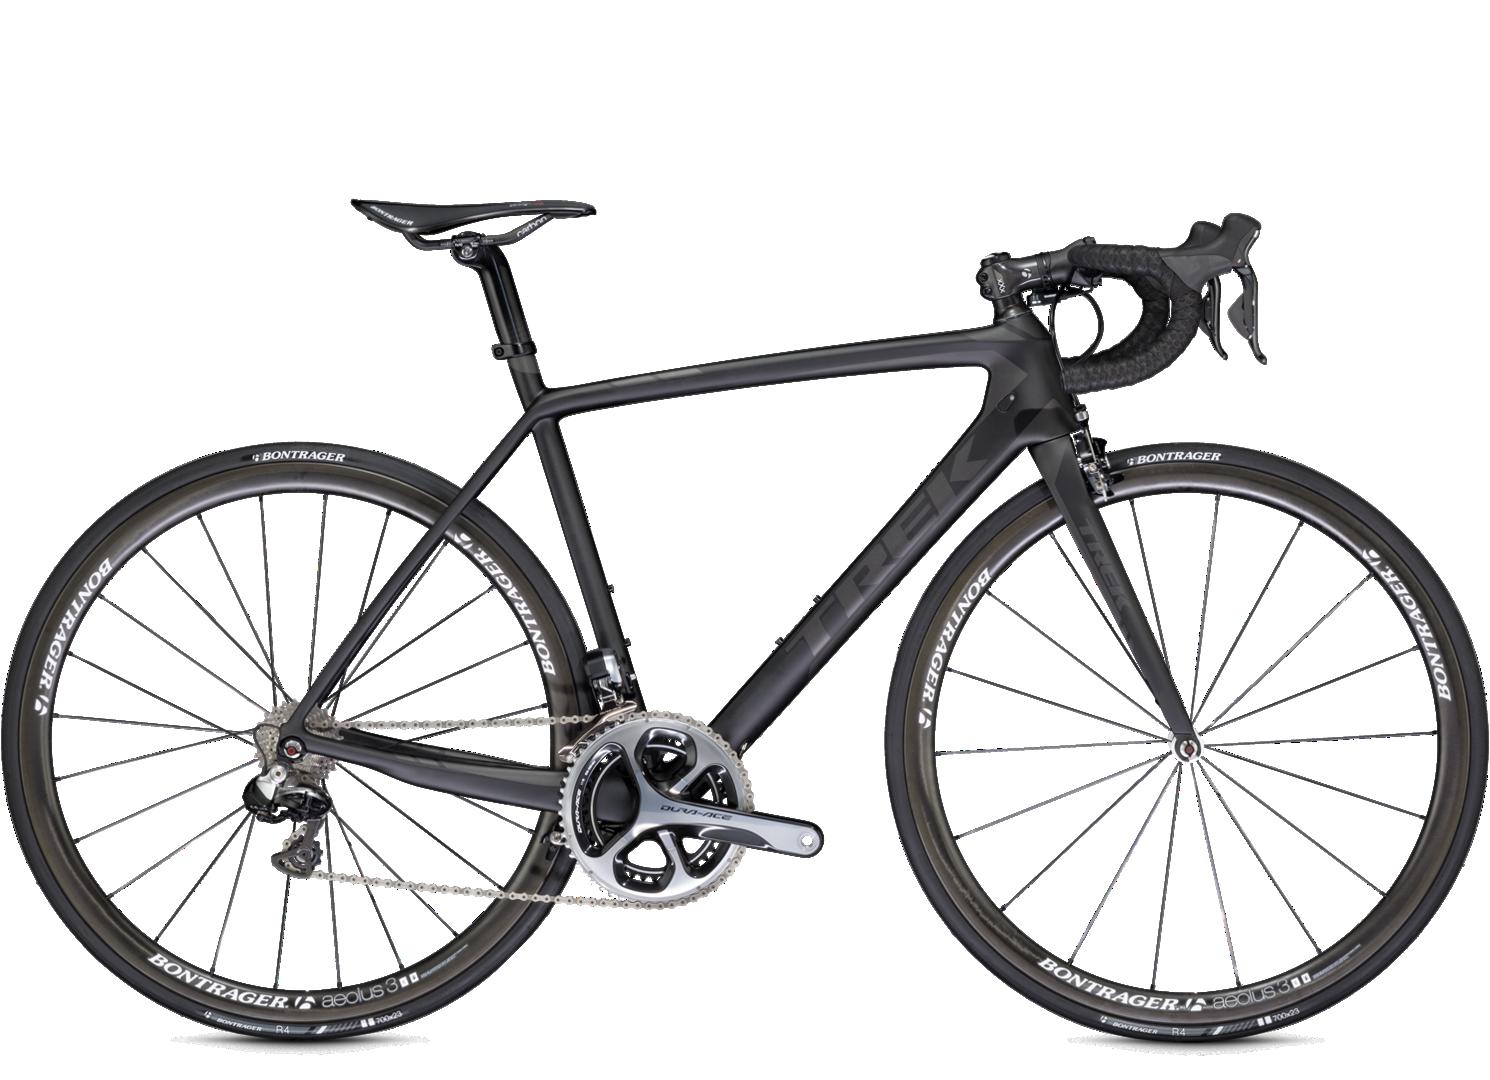 2015 Madone 7 9 H2 Compact - Bike Archive - Trek Bicycle